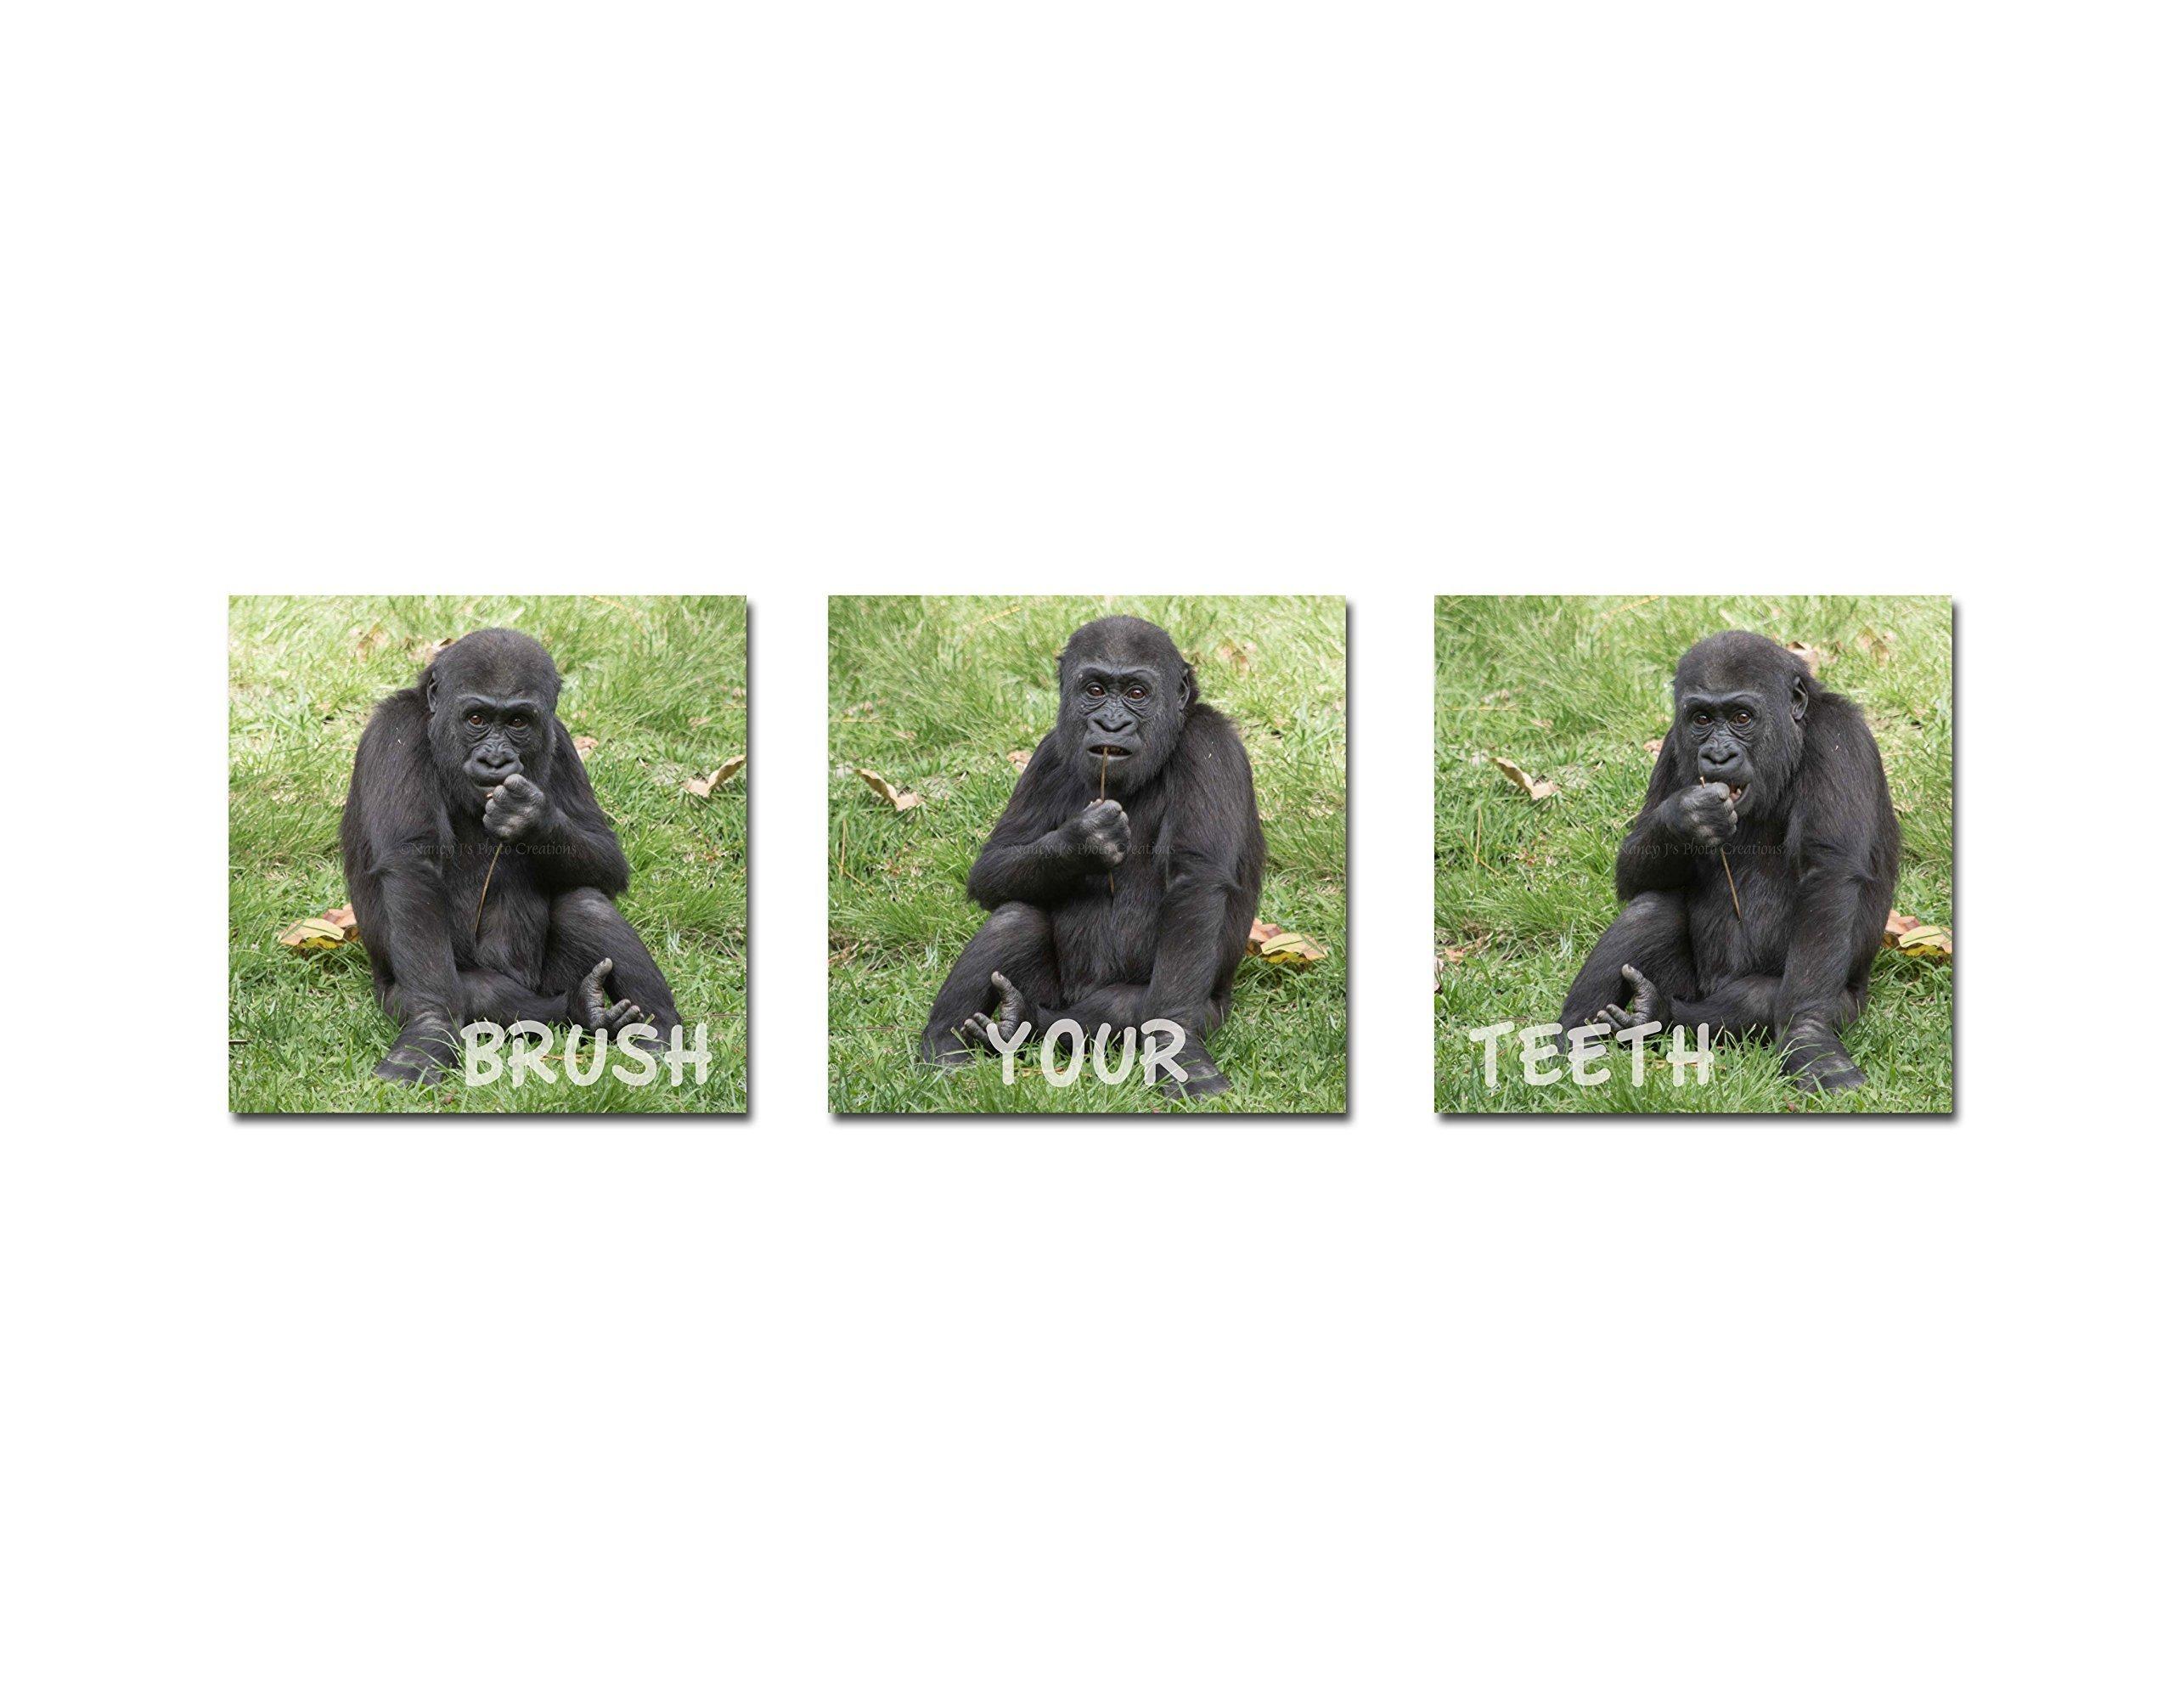 Brush Your Teeth Bathroom Art Set of 3 Baby Animal Prints Cute Gorilla Photo Funny Children's Wall Decor New Parent Unframed Photography Gift 5x5 8x8 10x10 12x12 16x16 20x20